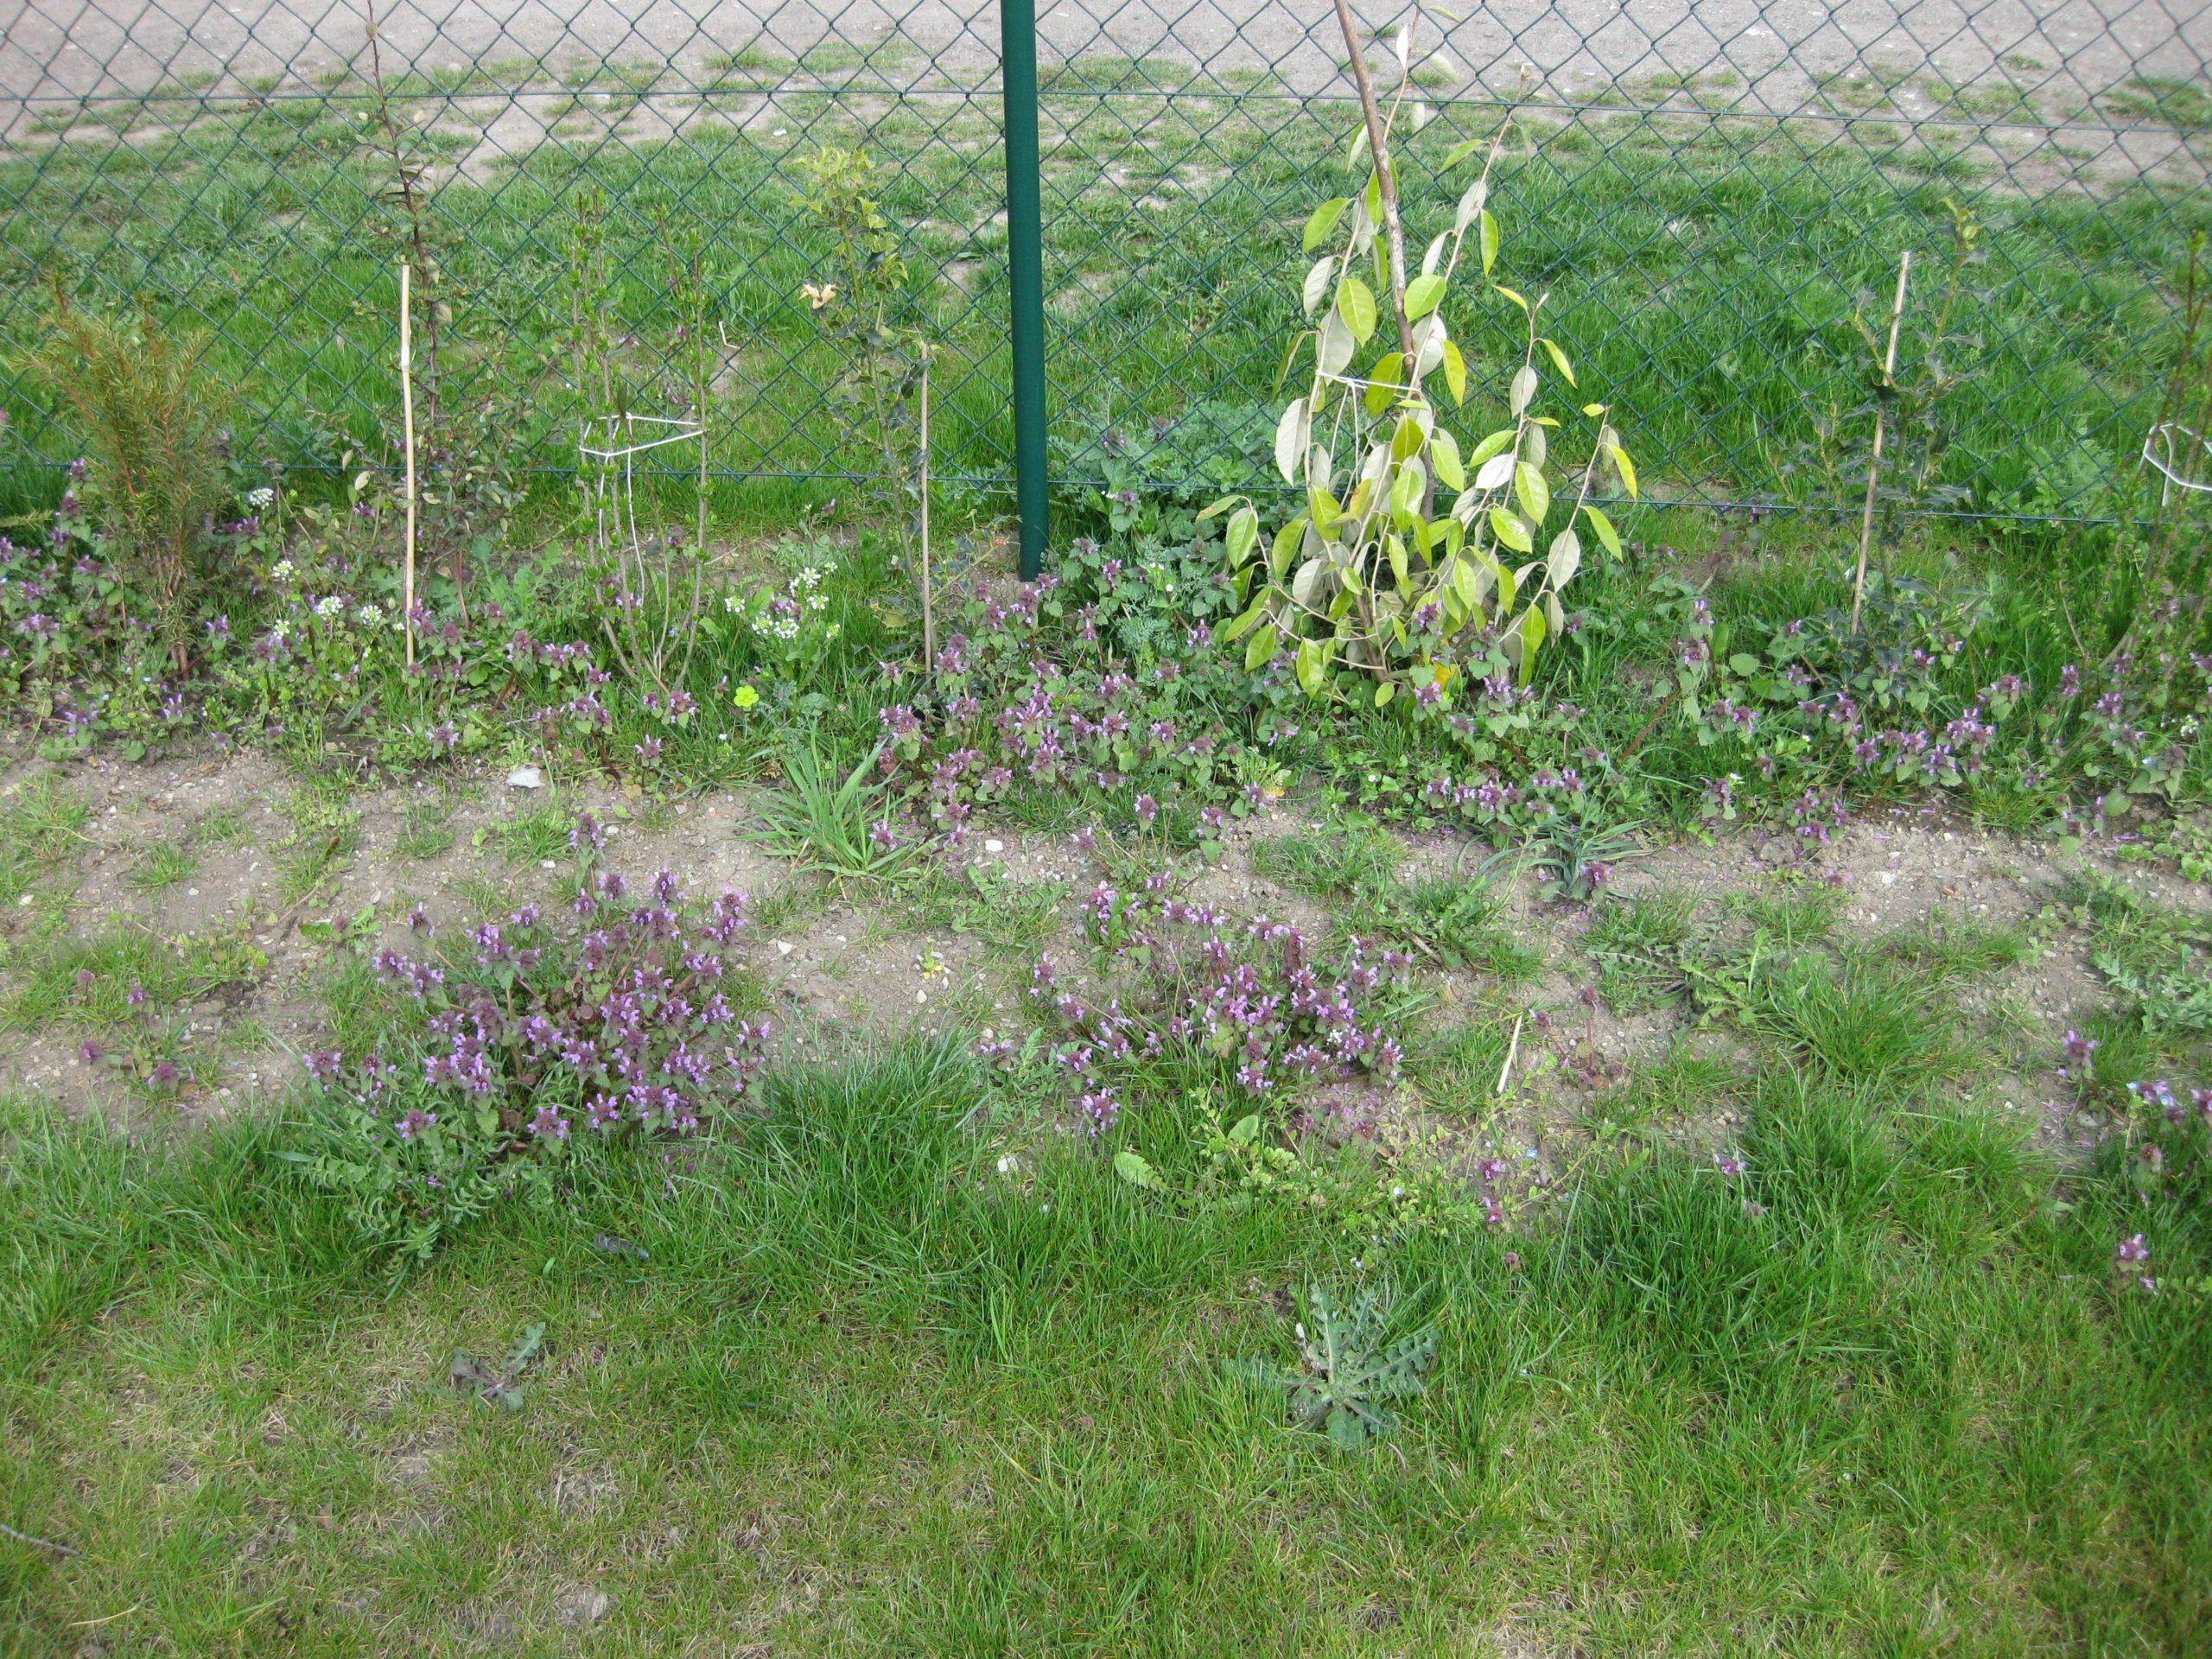 Wildwuchs - Purpurrote Taubnessel Blüte